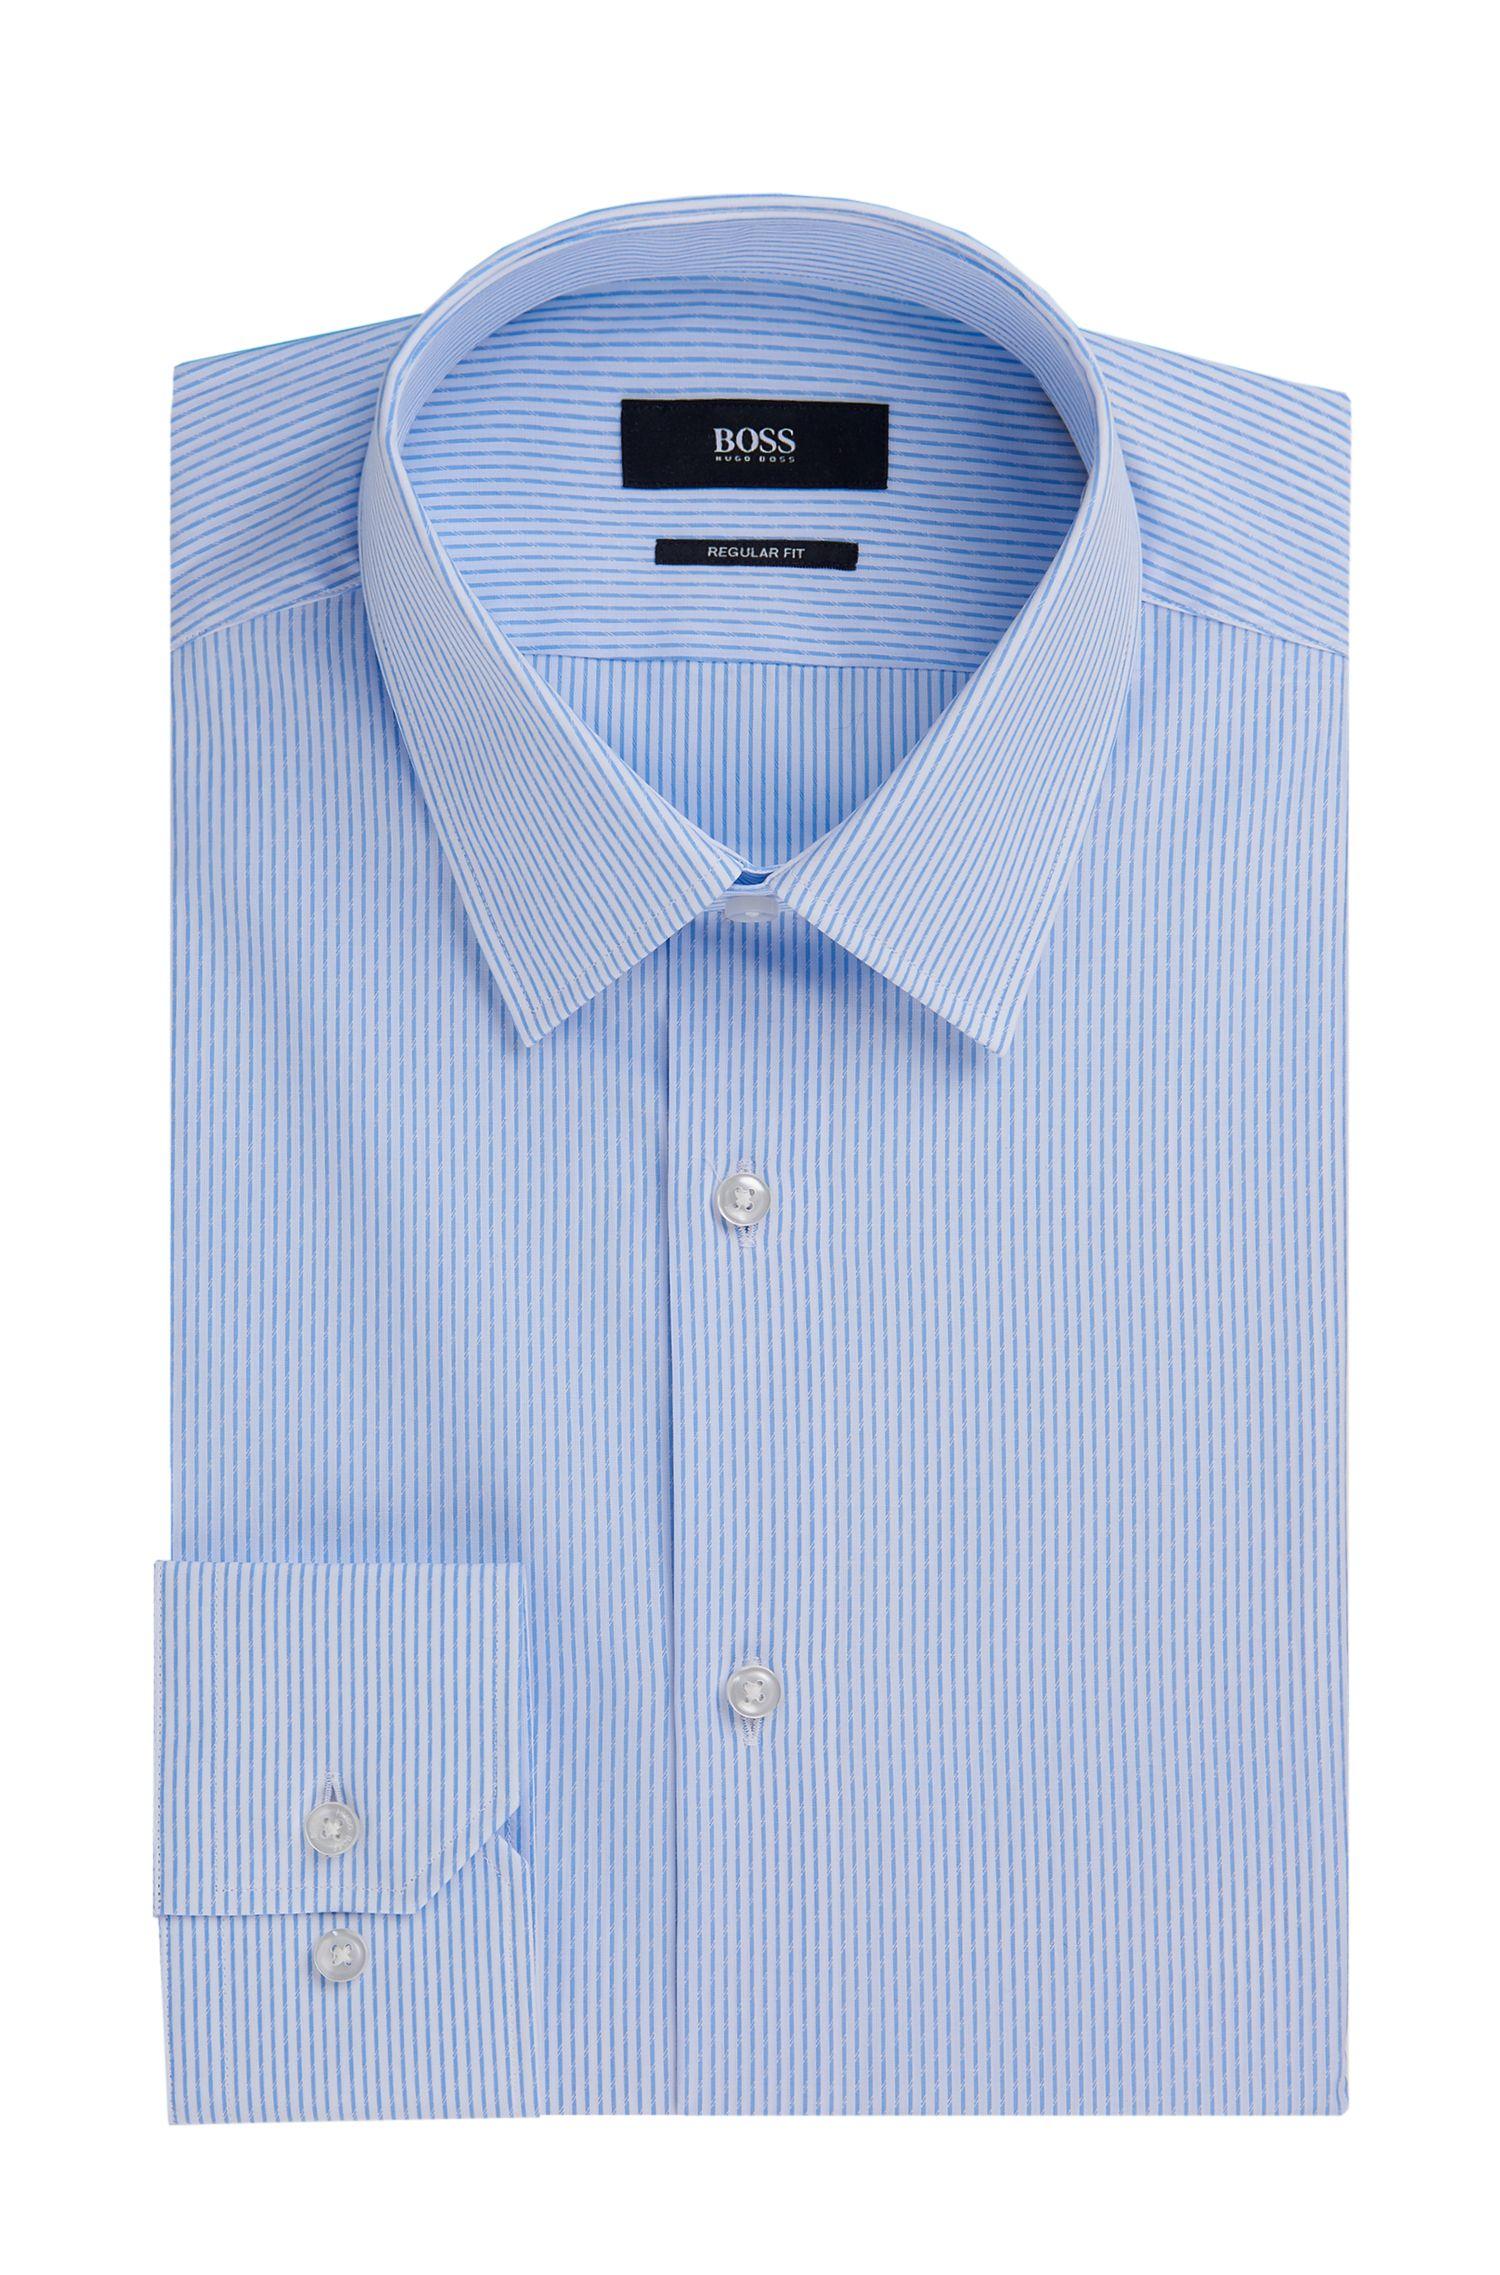 Striped Cotton Dress Shirt, Regular Fit   Enzo